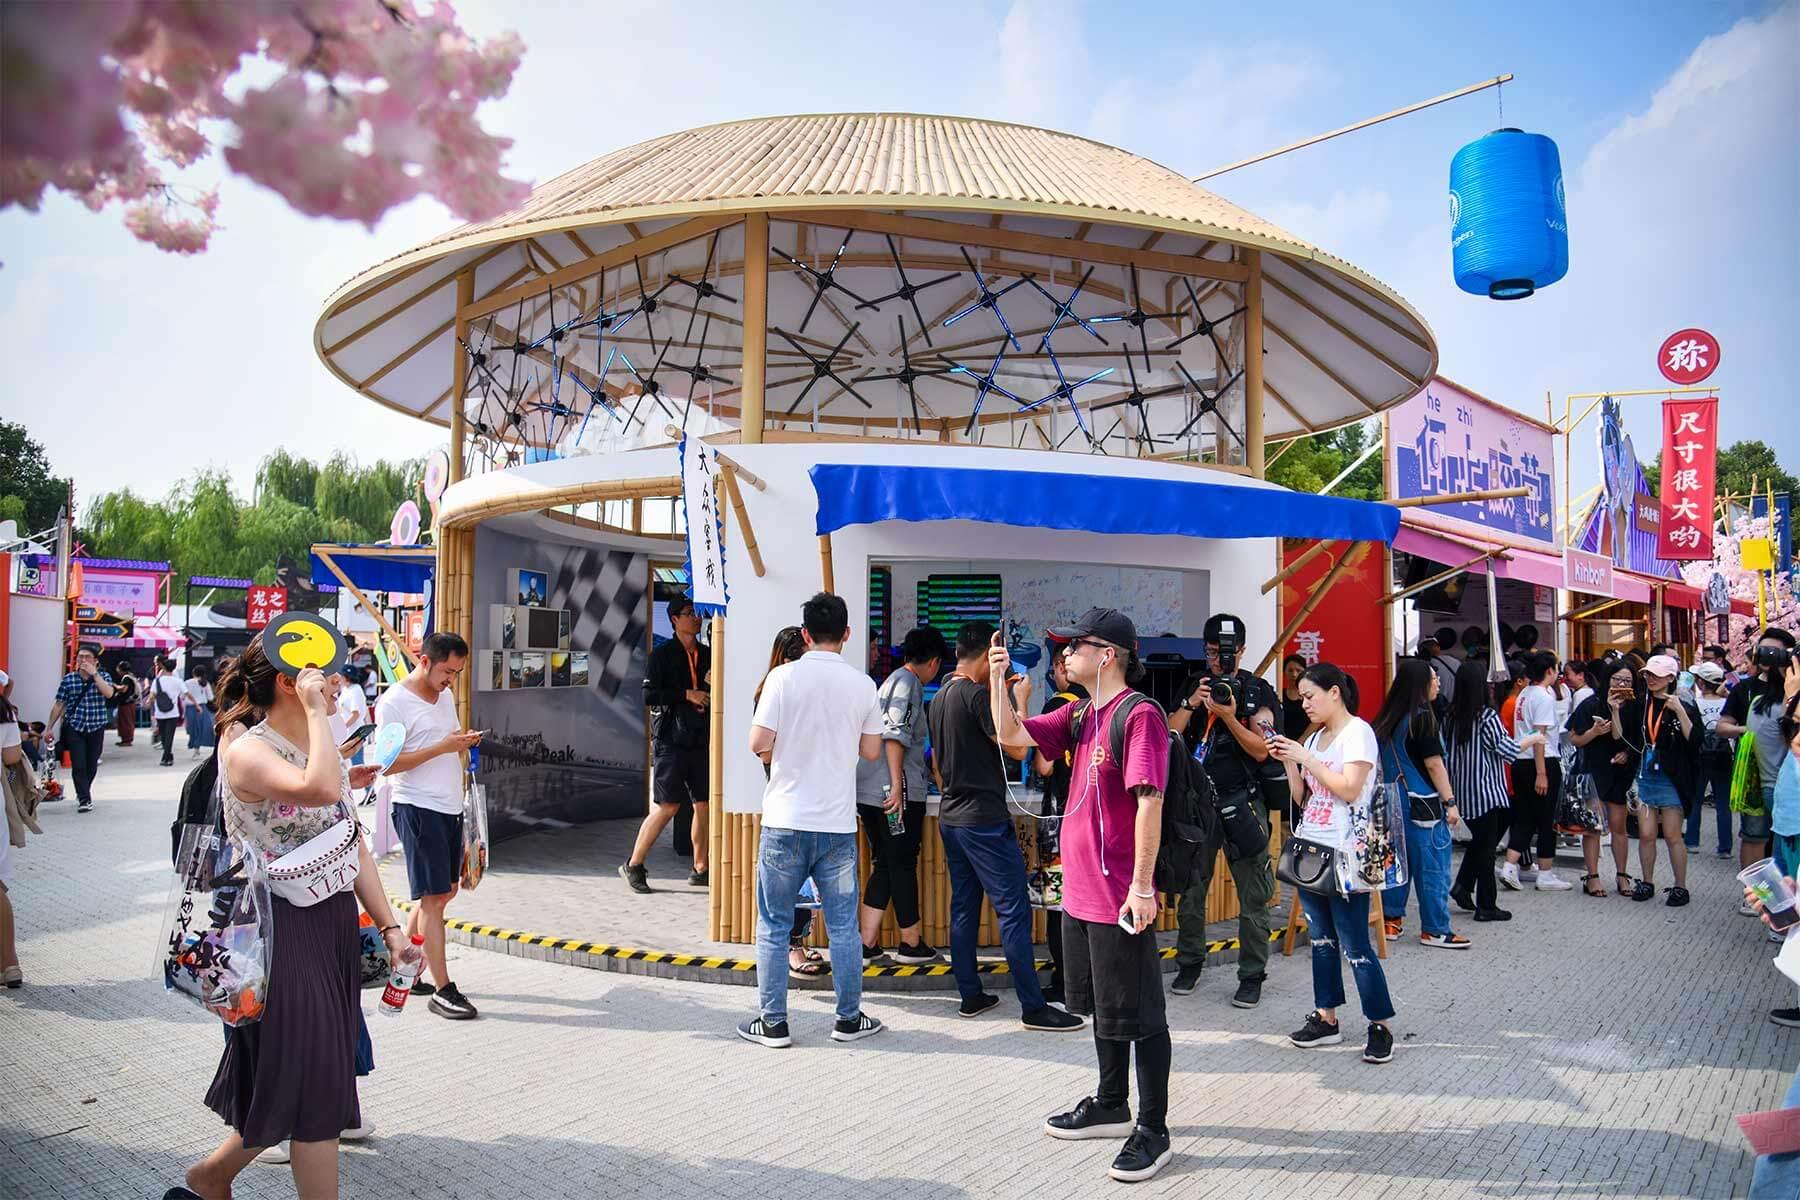 VOLKSWAGEN CHINA TAOBAO MAKER FESTIVAL